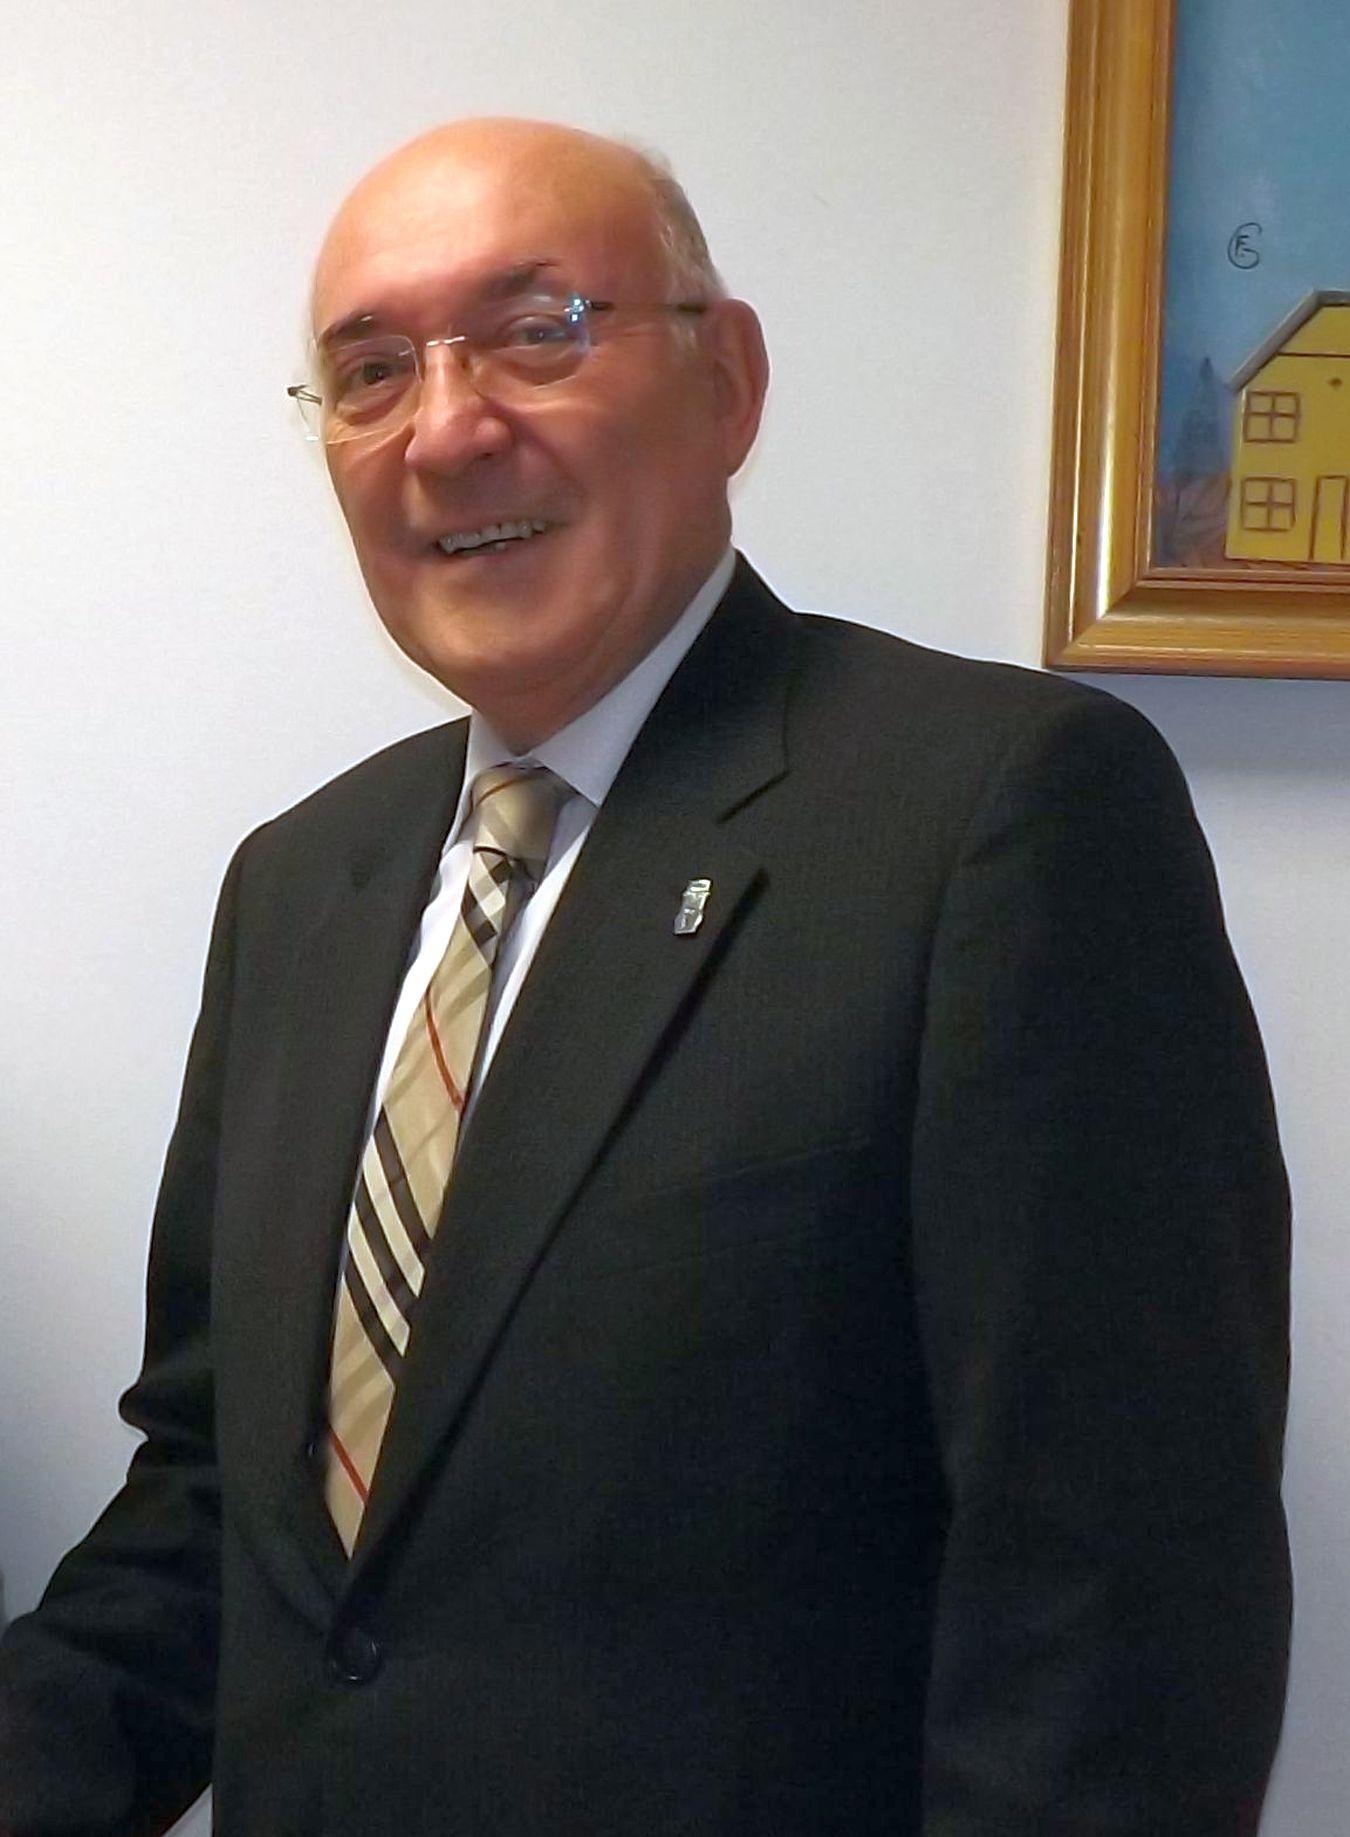 Arrigo Simoni